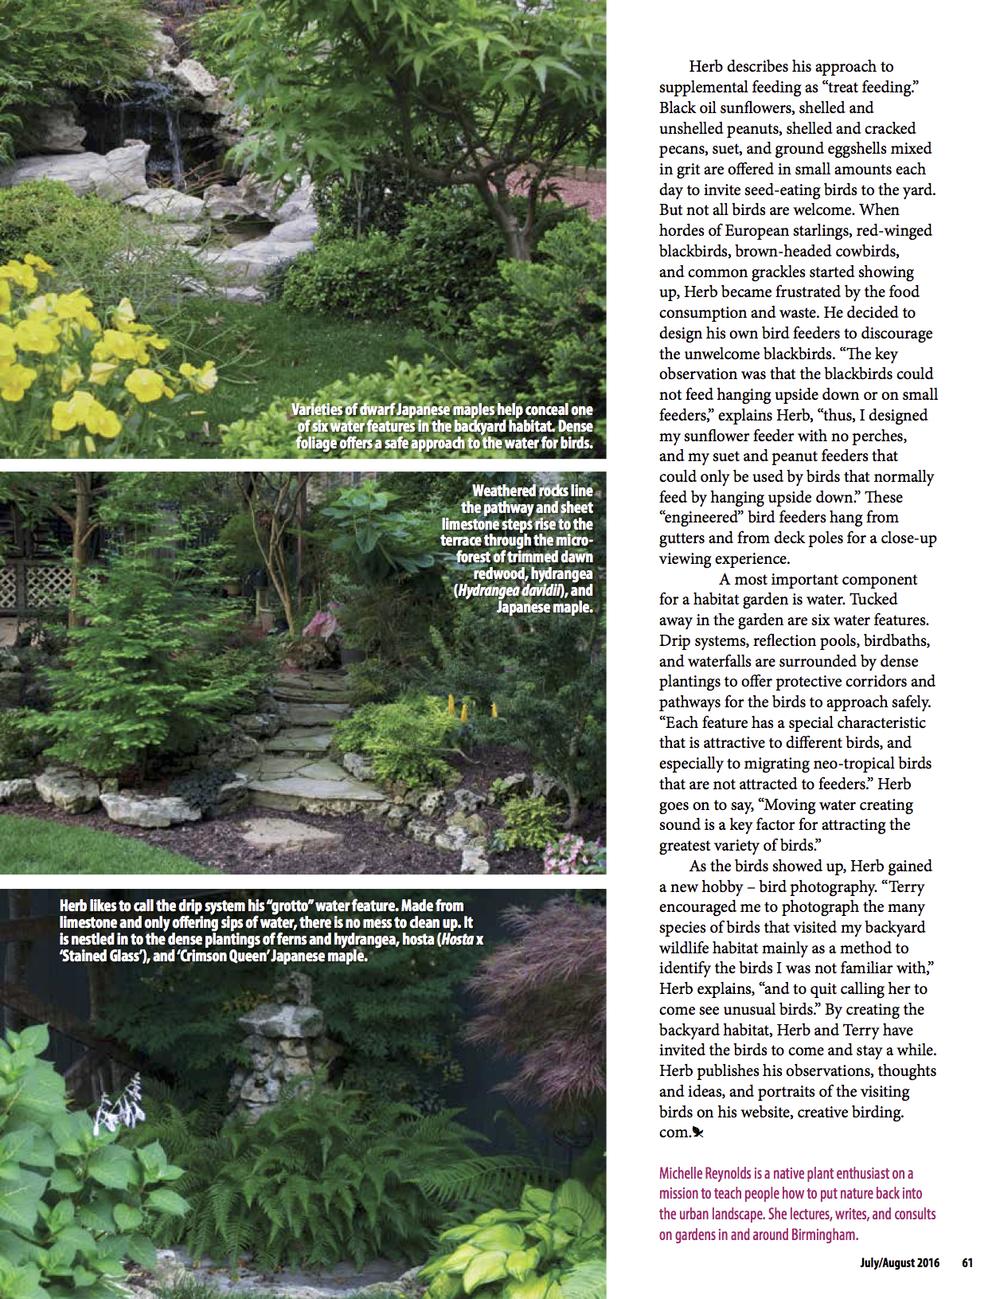 ALG_JulAug16_GardenProfile_Reynolds4.jpg